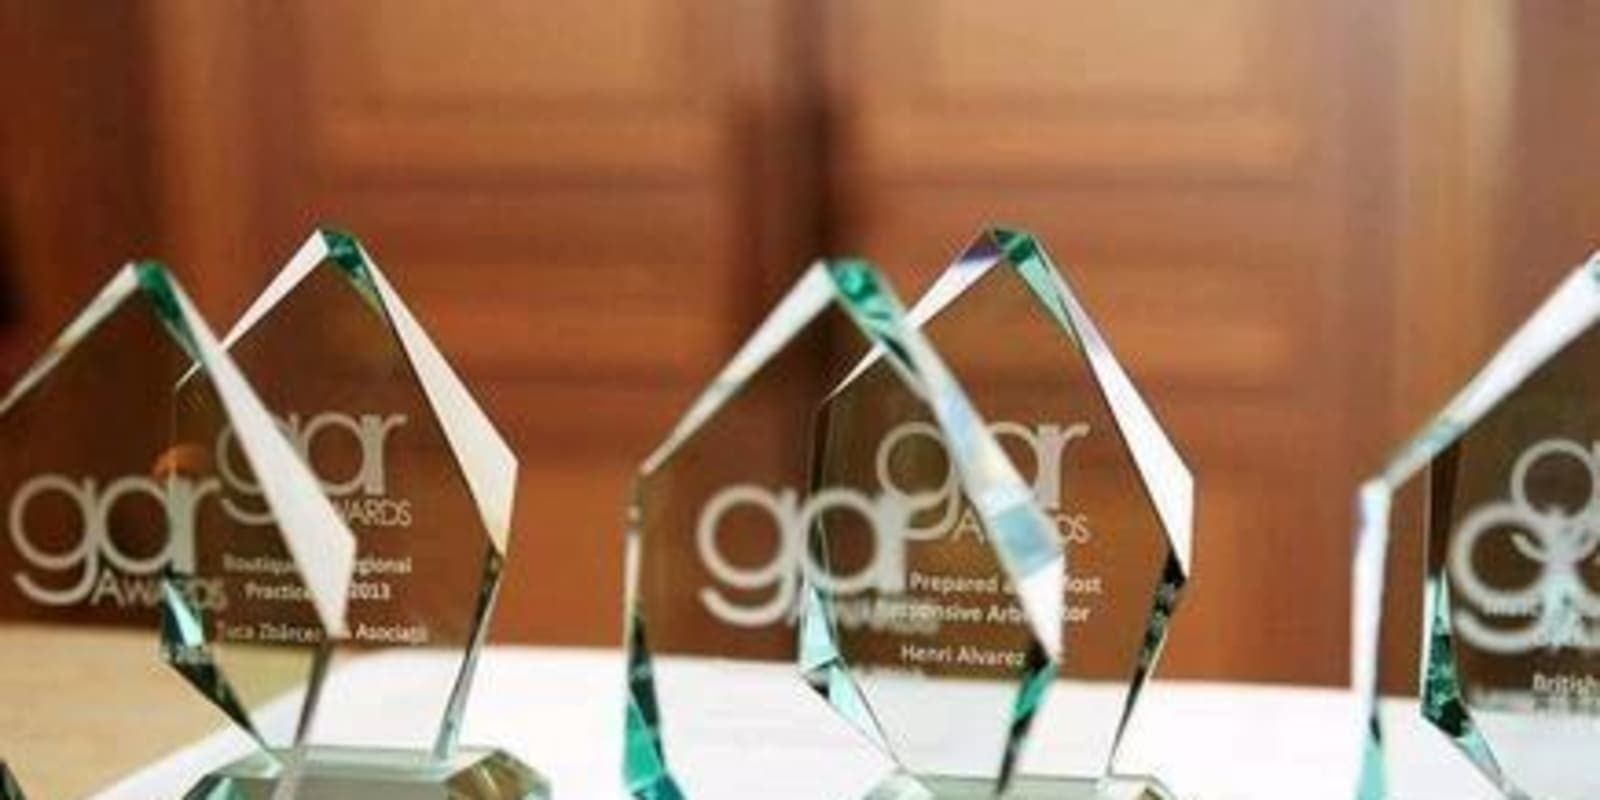 GAR Awards 2017 – first shortlist for Milan